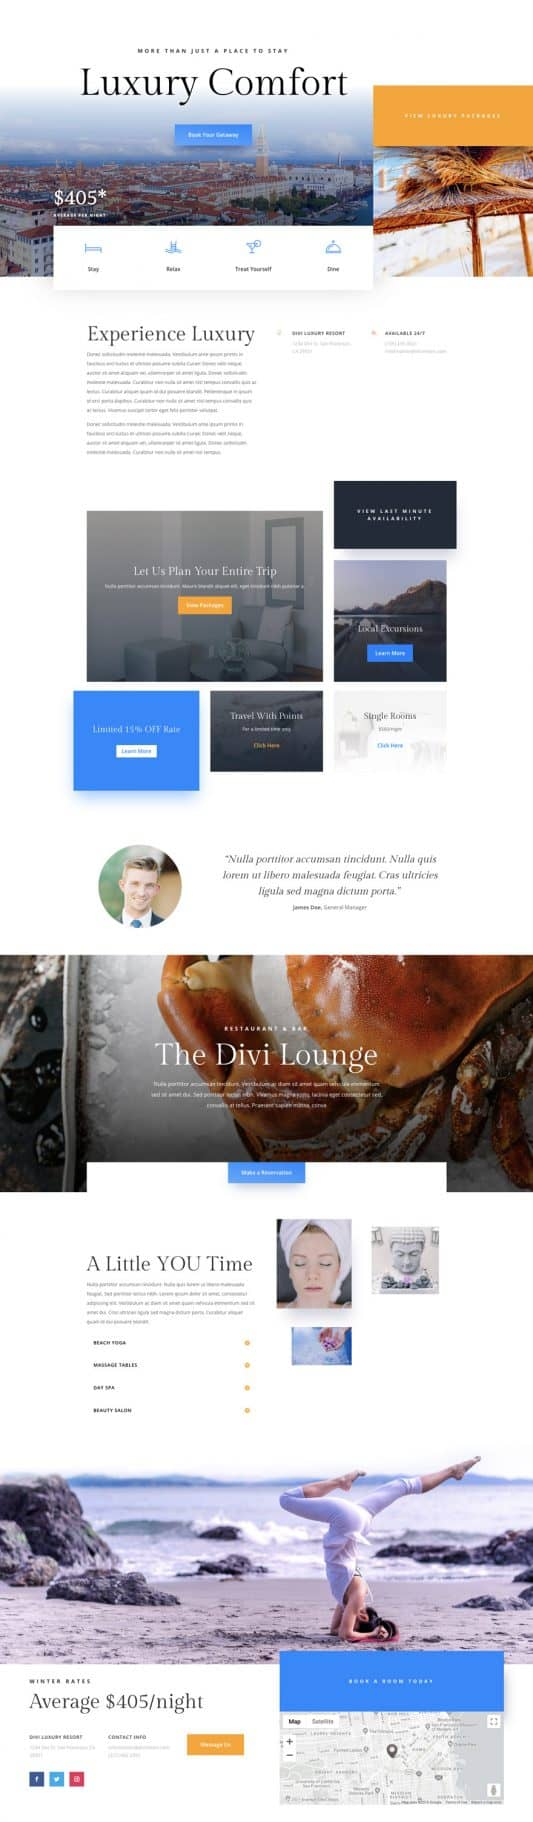 Resort Web Design 4